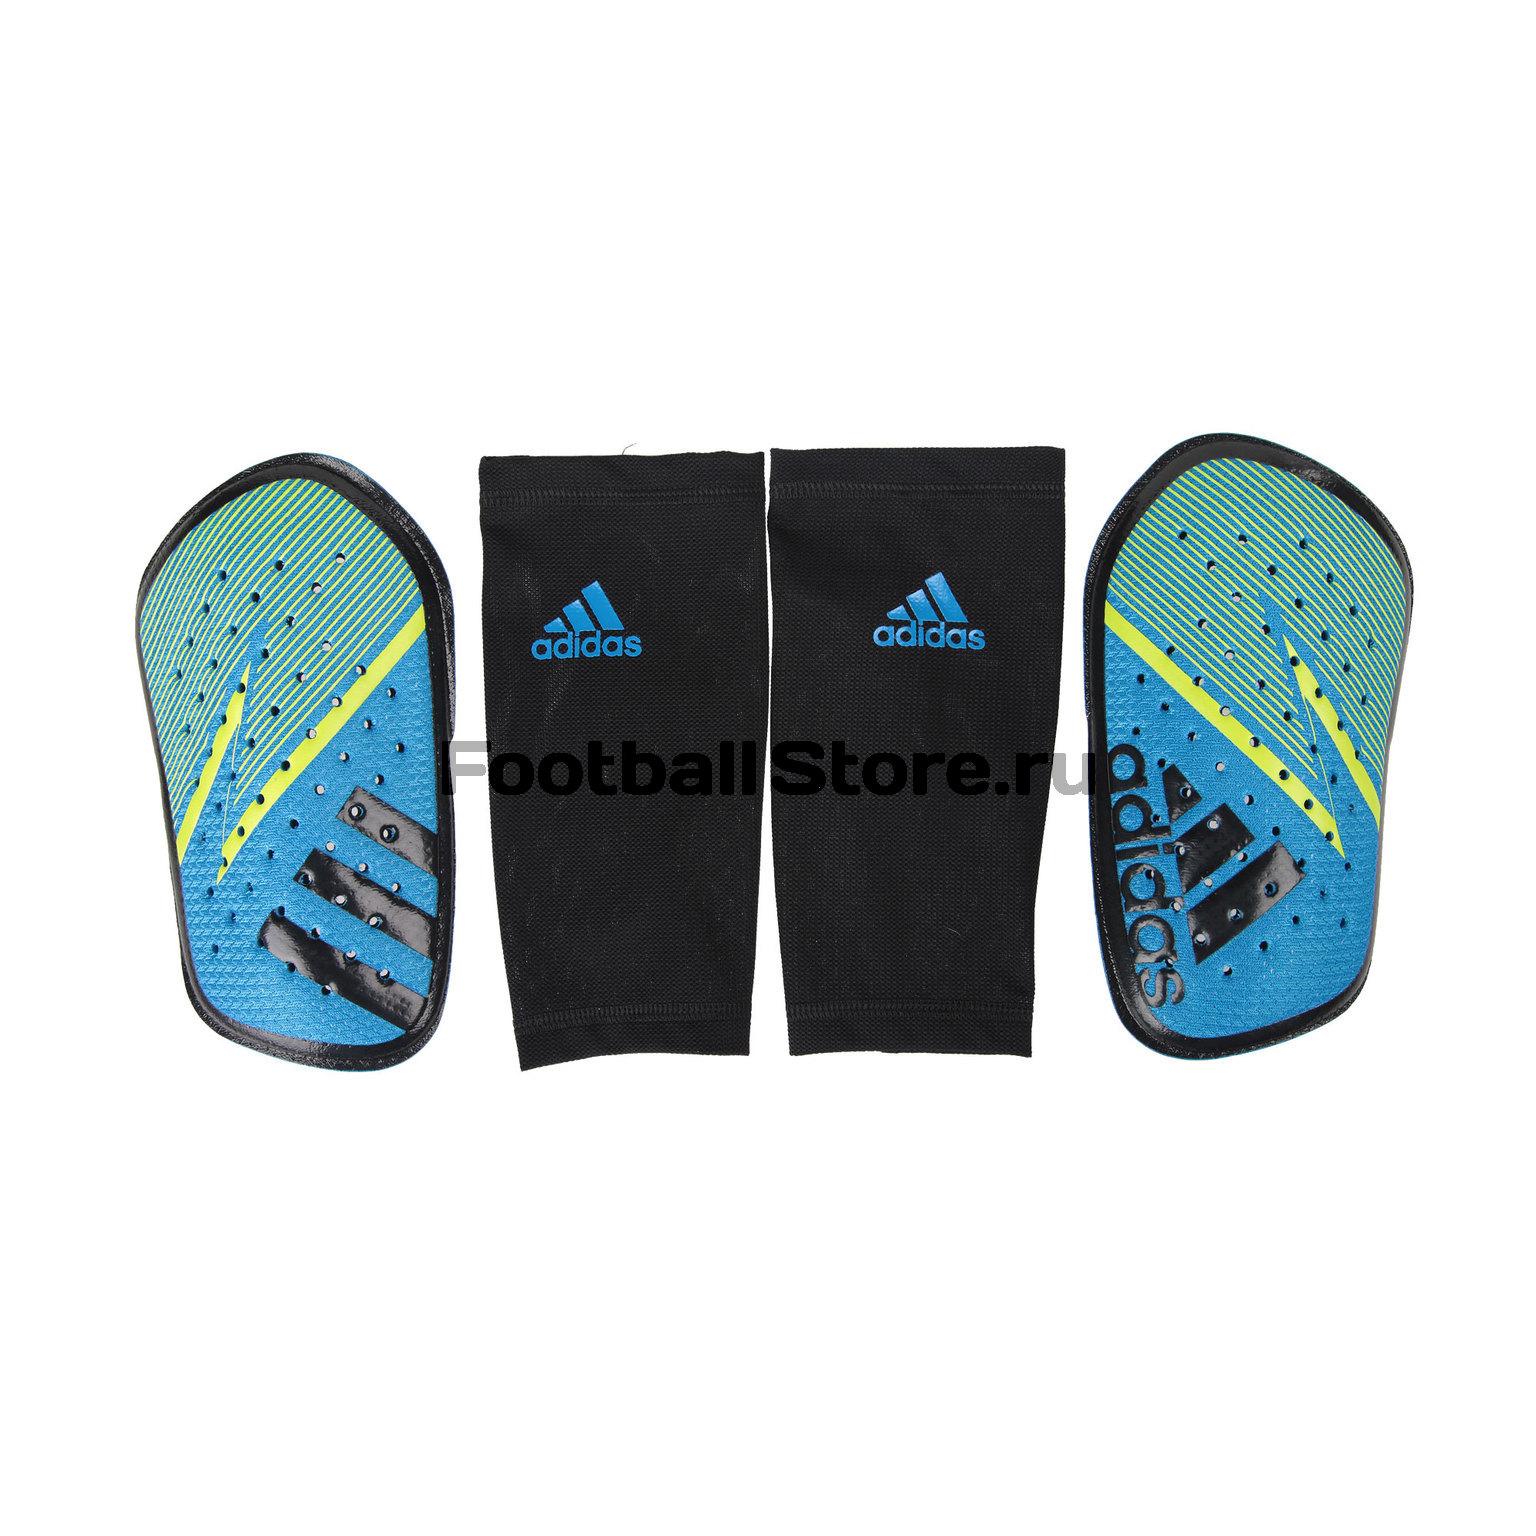 Щитки Adidas Ghost CC AI5232 цены онлайн